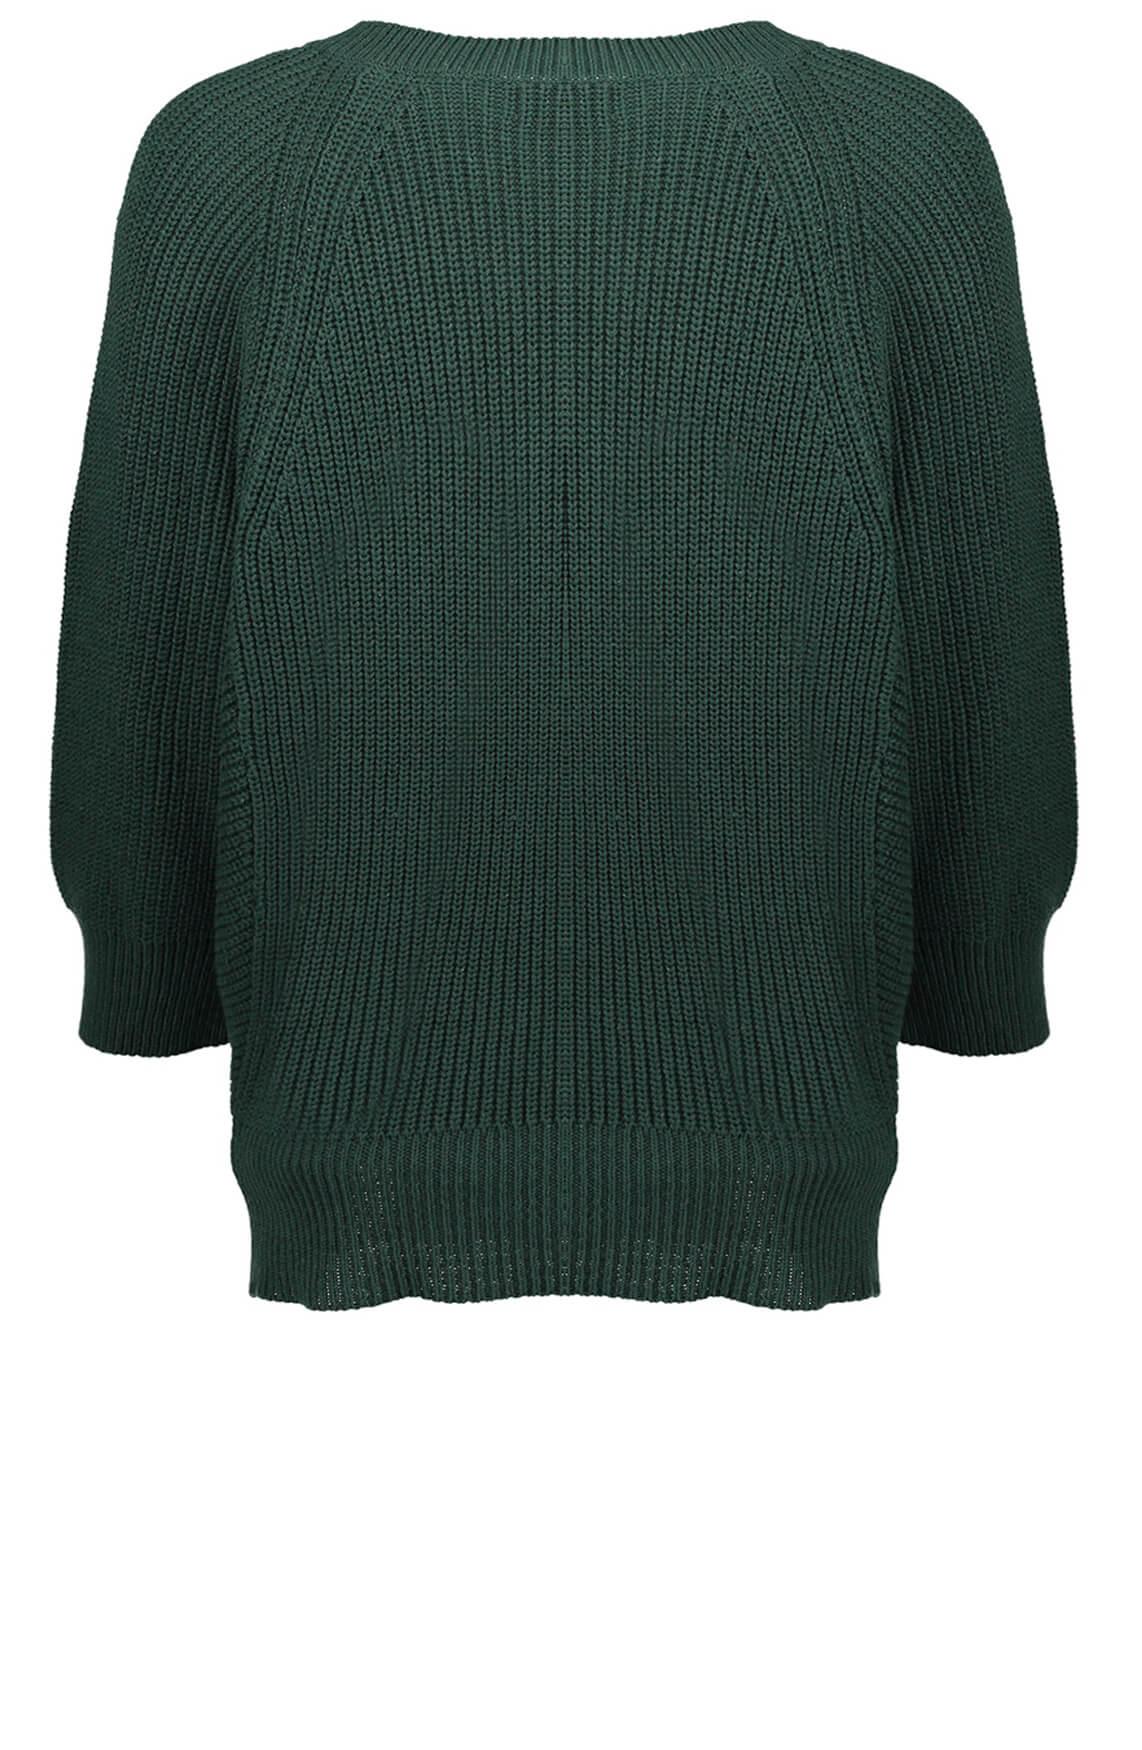 Geisha Dames Pullover met V-hals groen